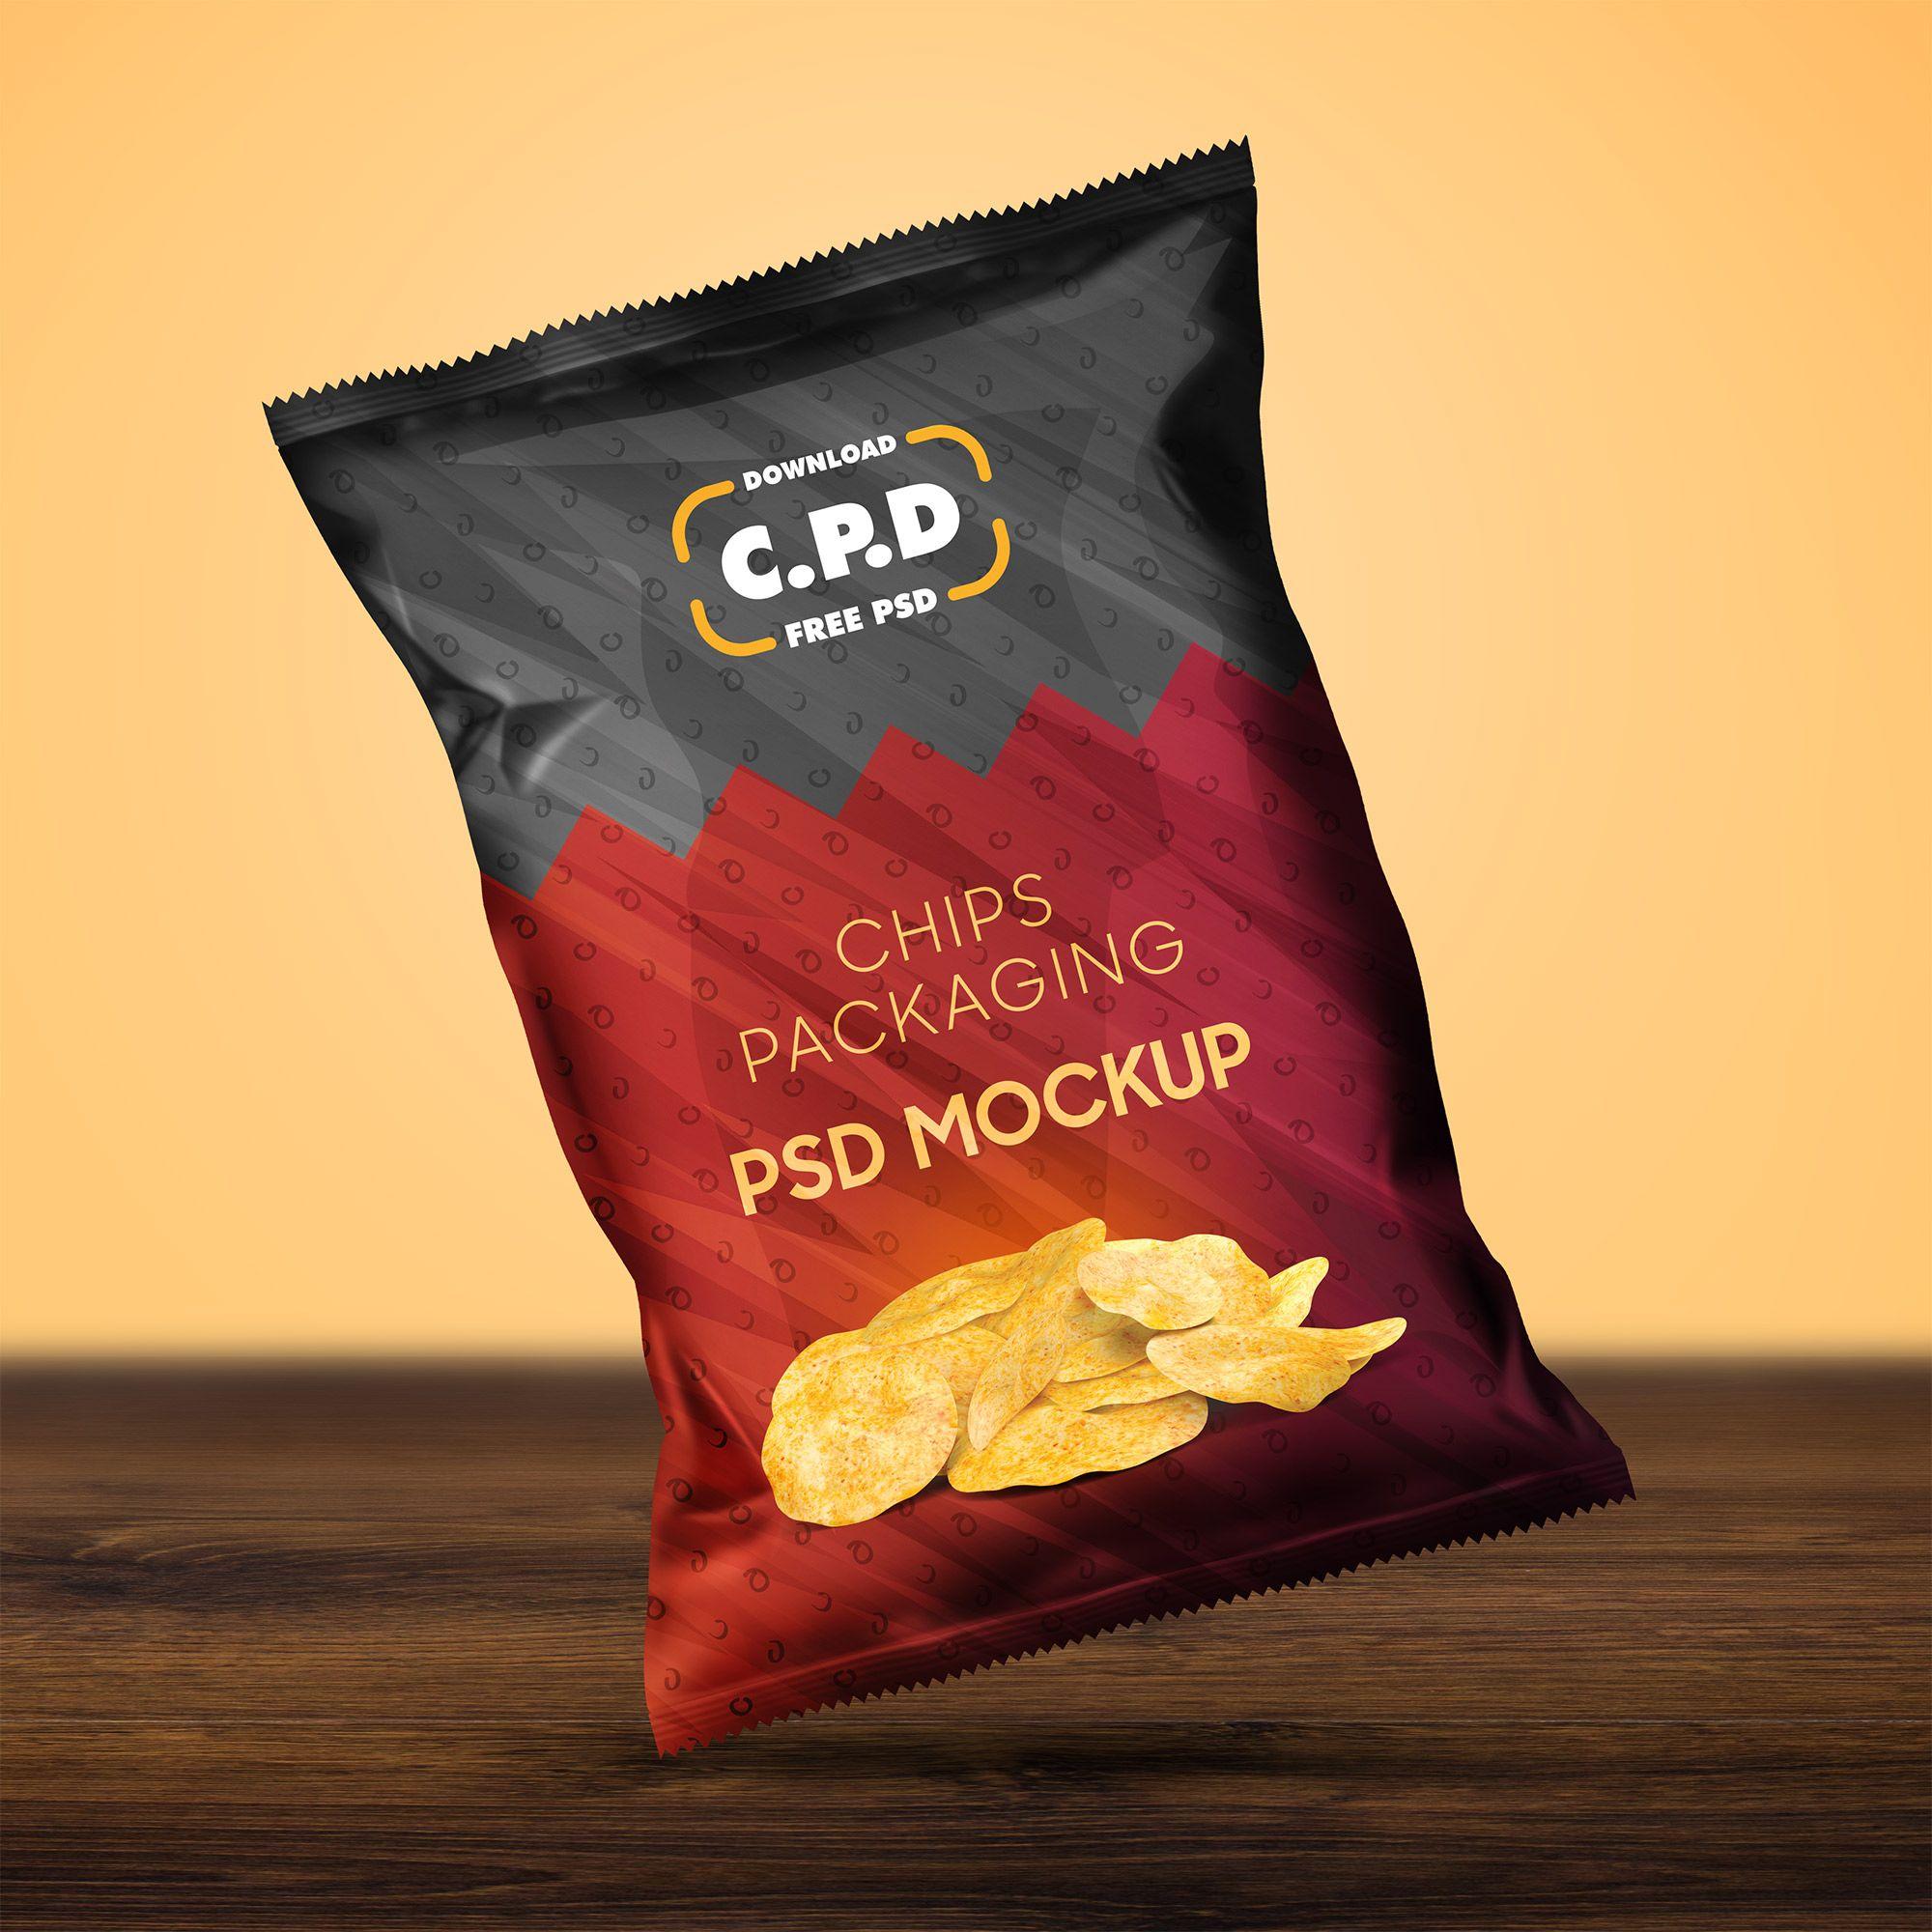 Download 25 Chips Packaging Mockup Templates For Presentation Chip Packaging Food Poster Design Packaging